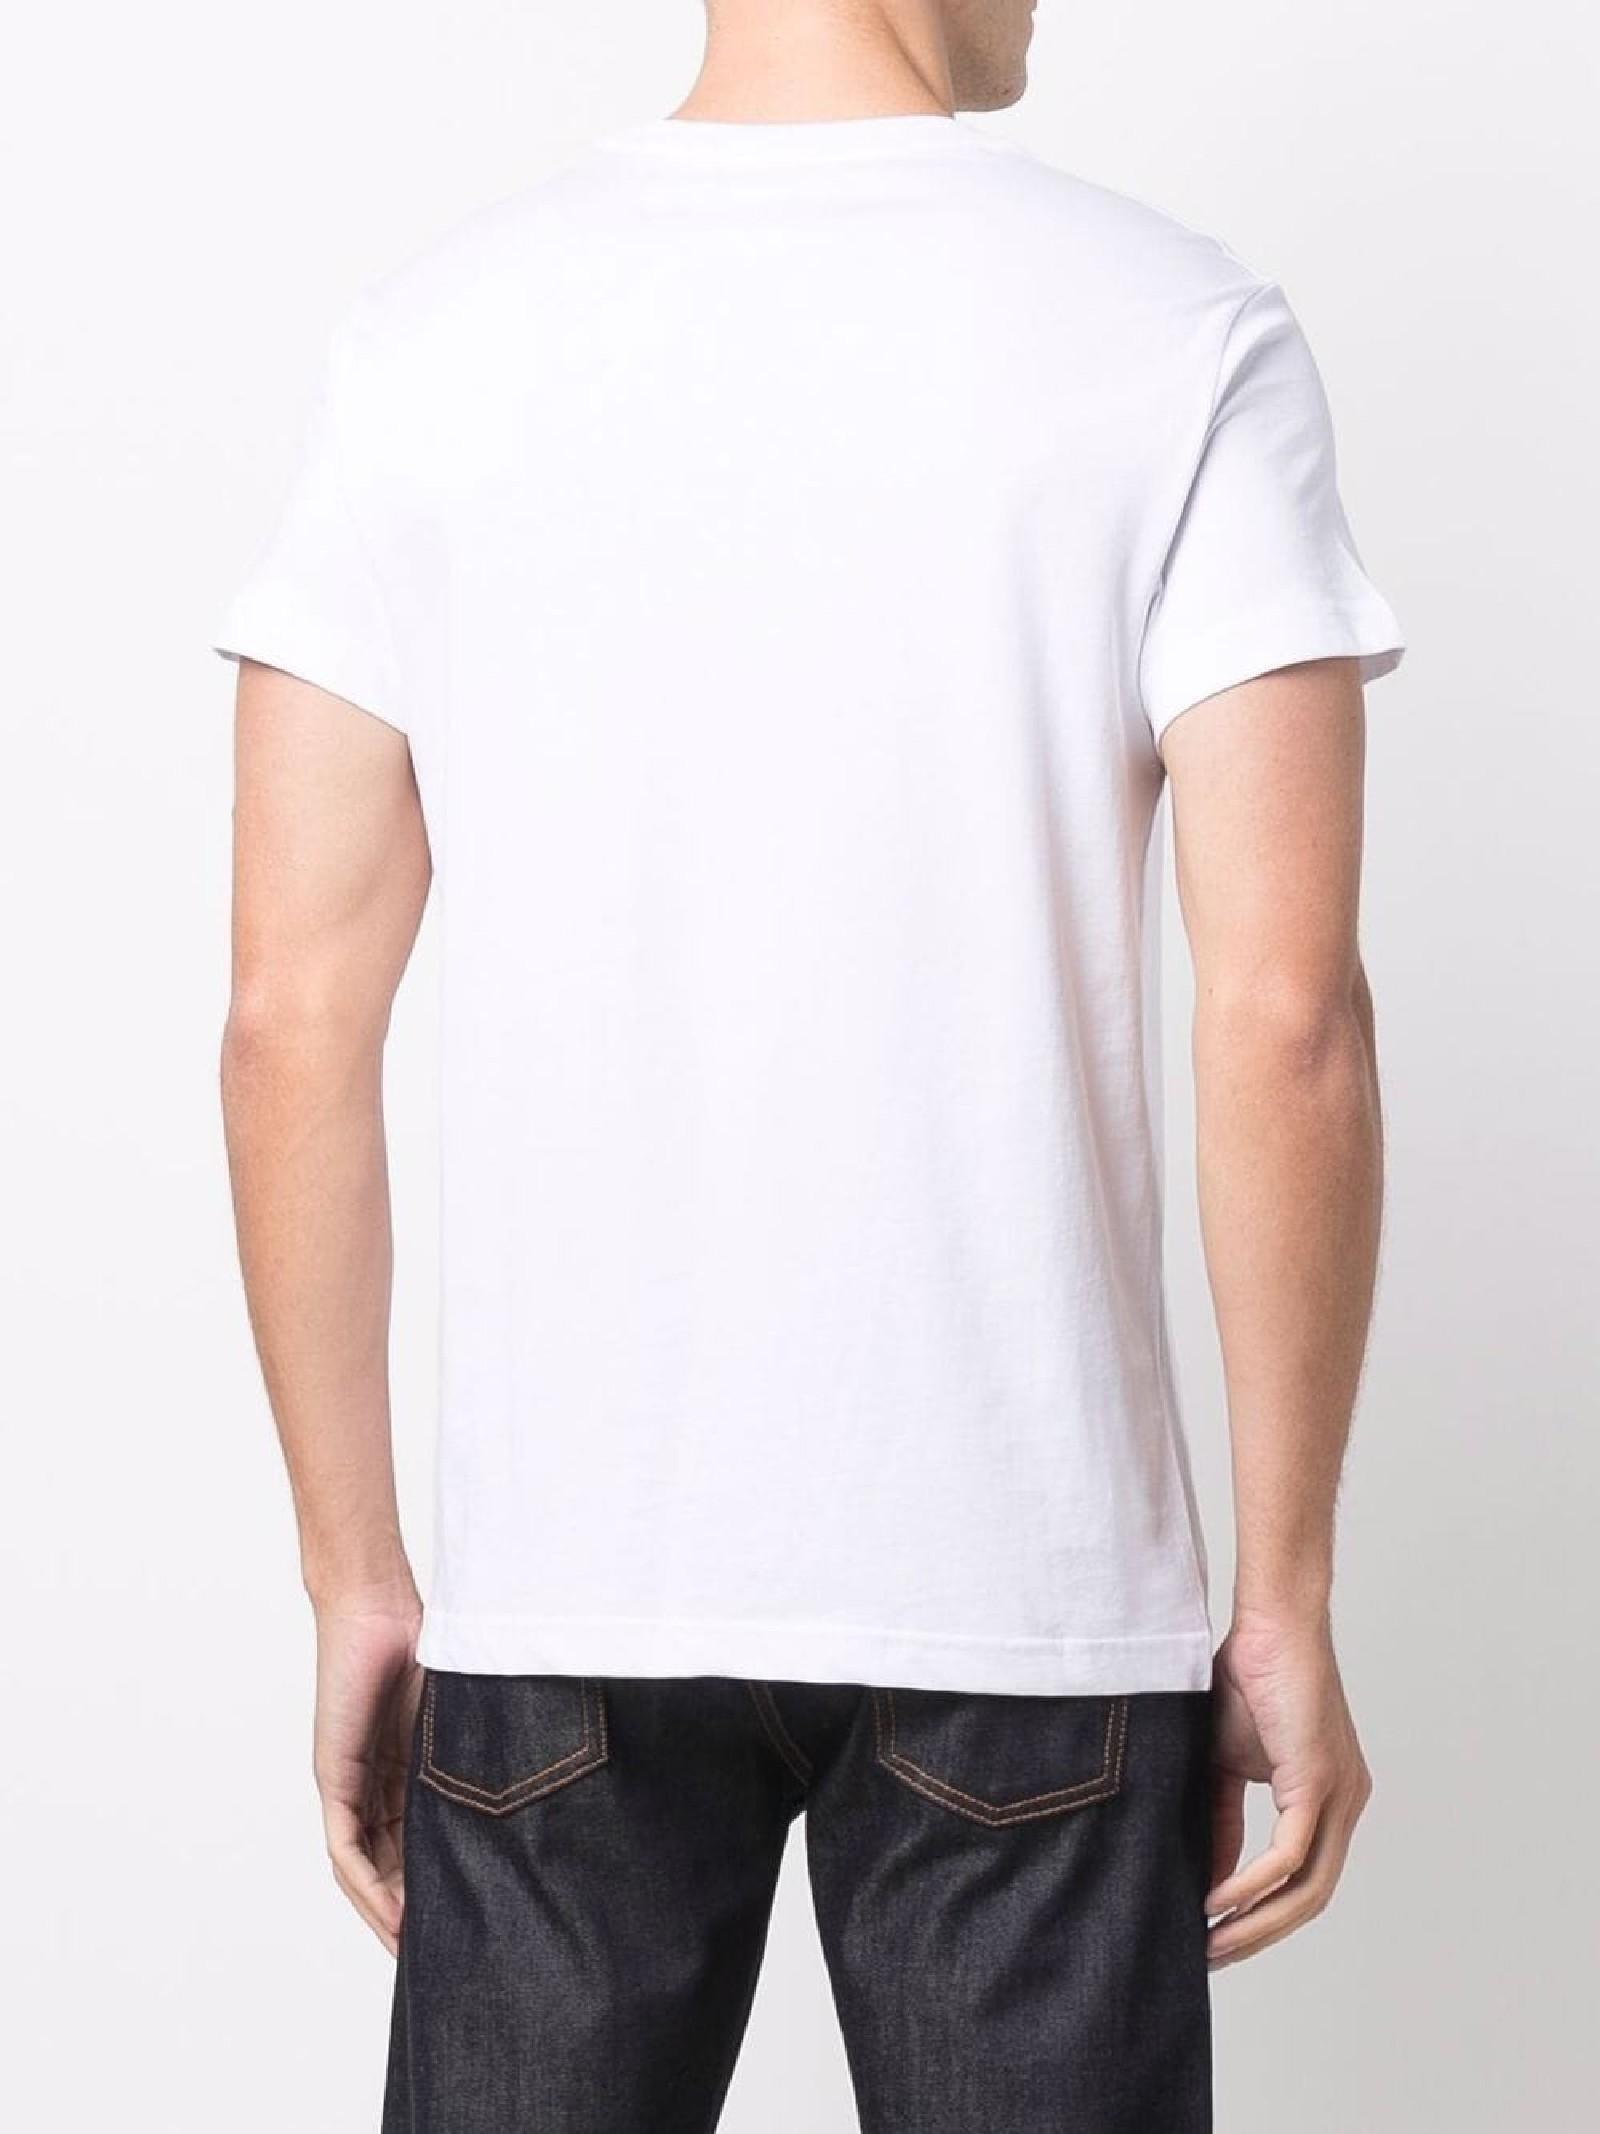 t-shirt maiche corte e stampa VERSACE JEANS   T-shirt   71GAHT12 CJ00TG03